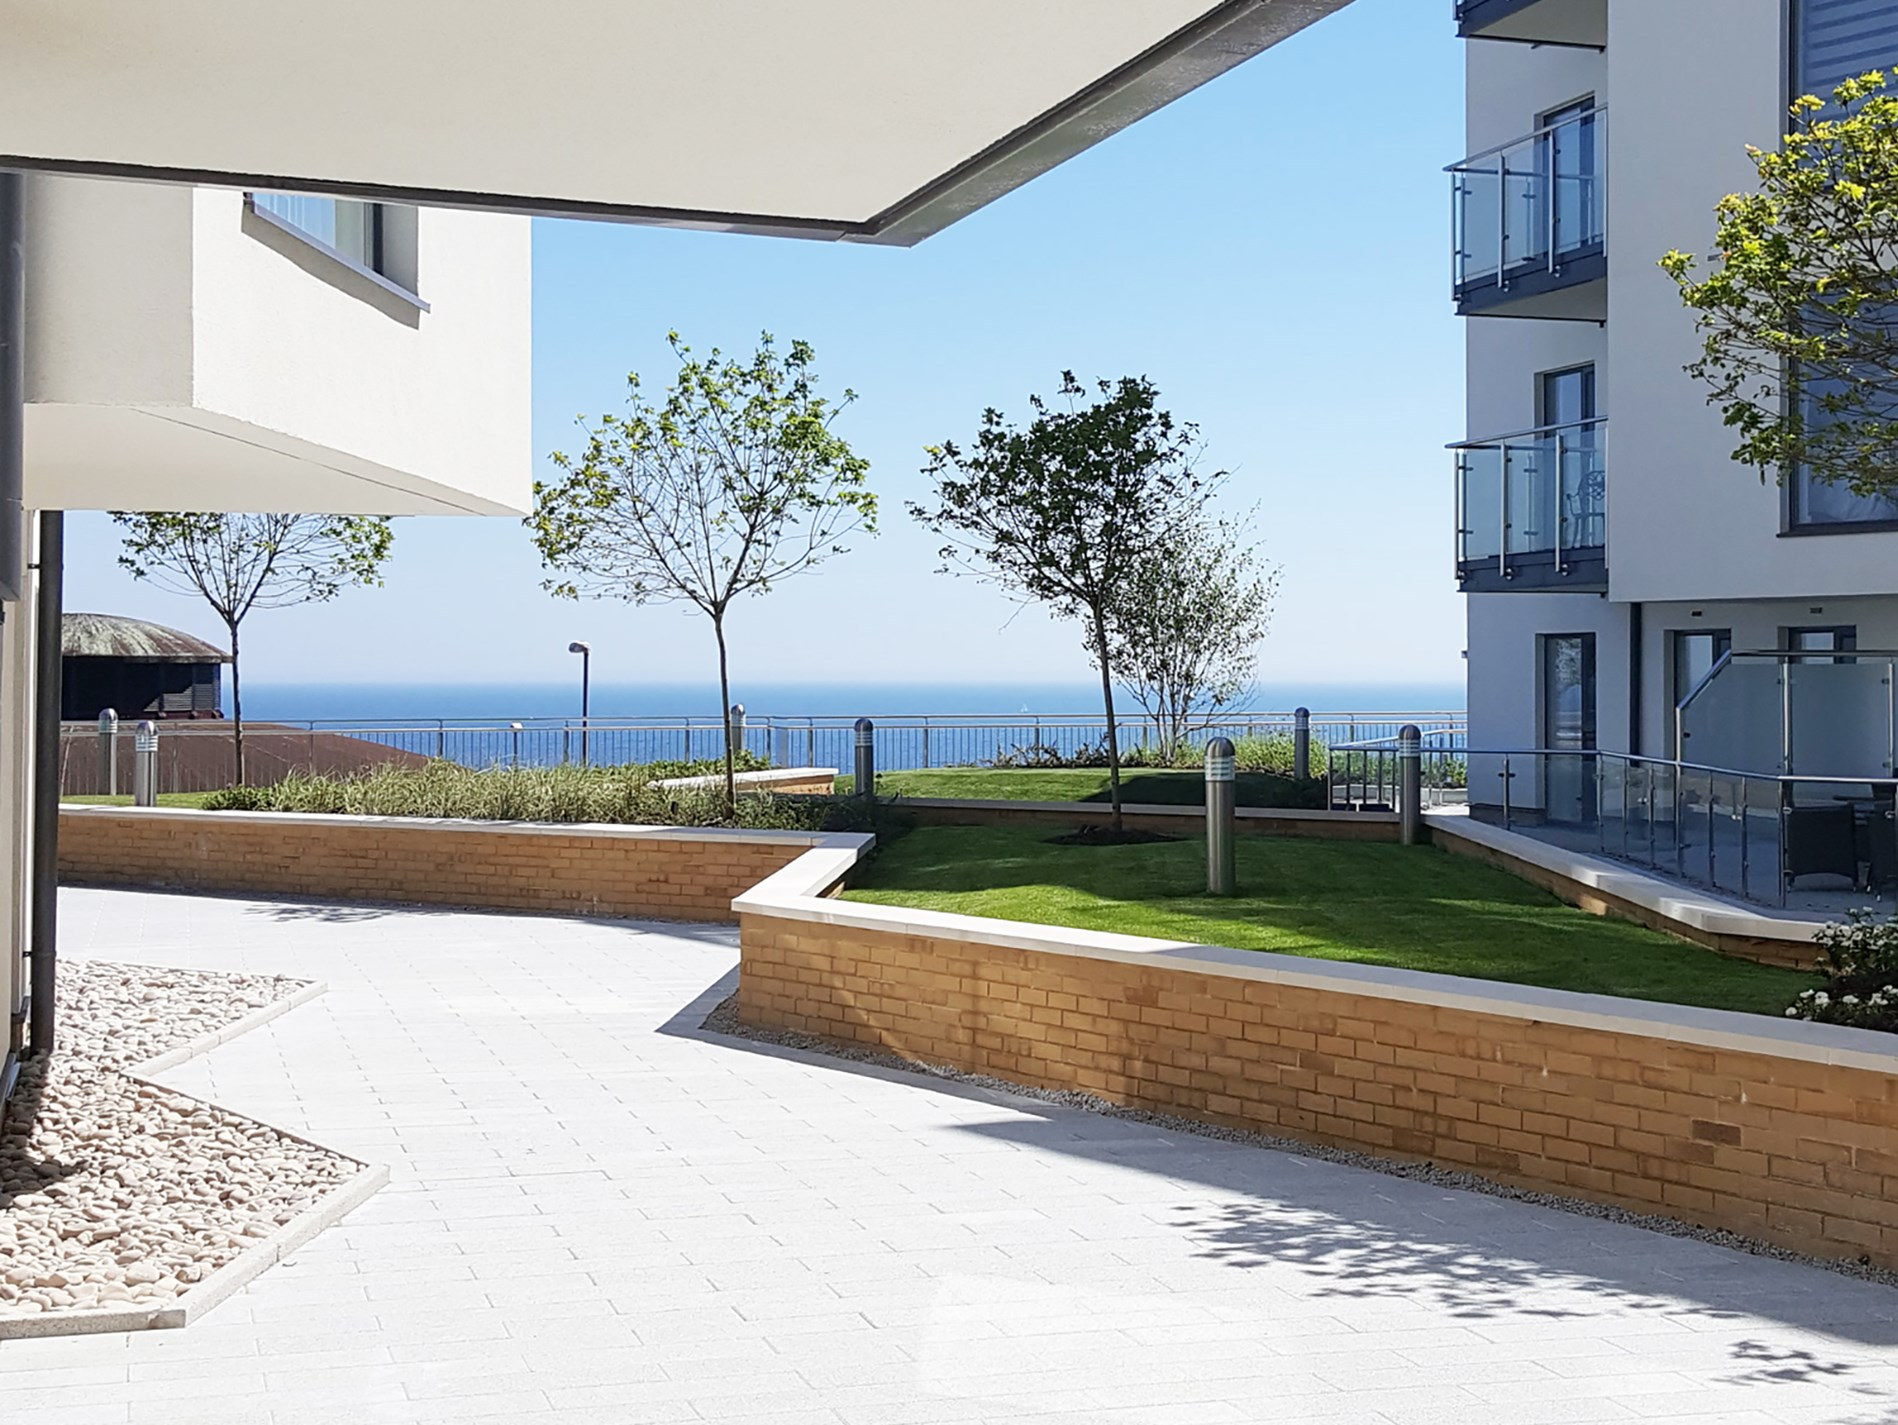 Views surrounding the property